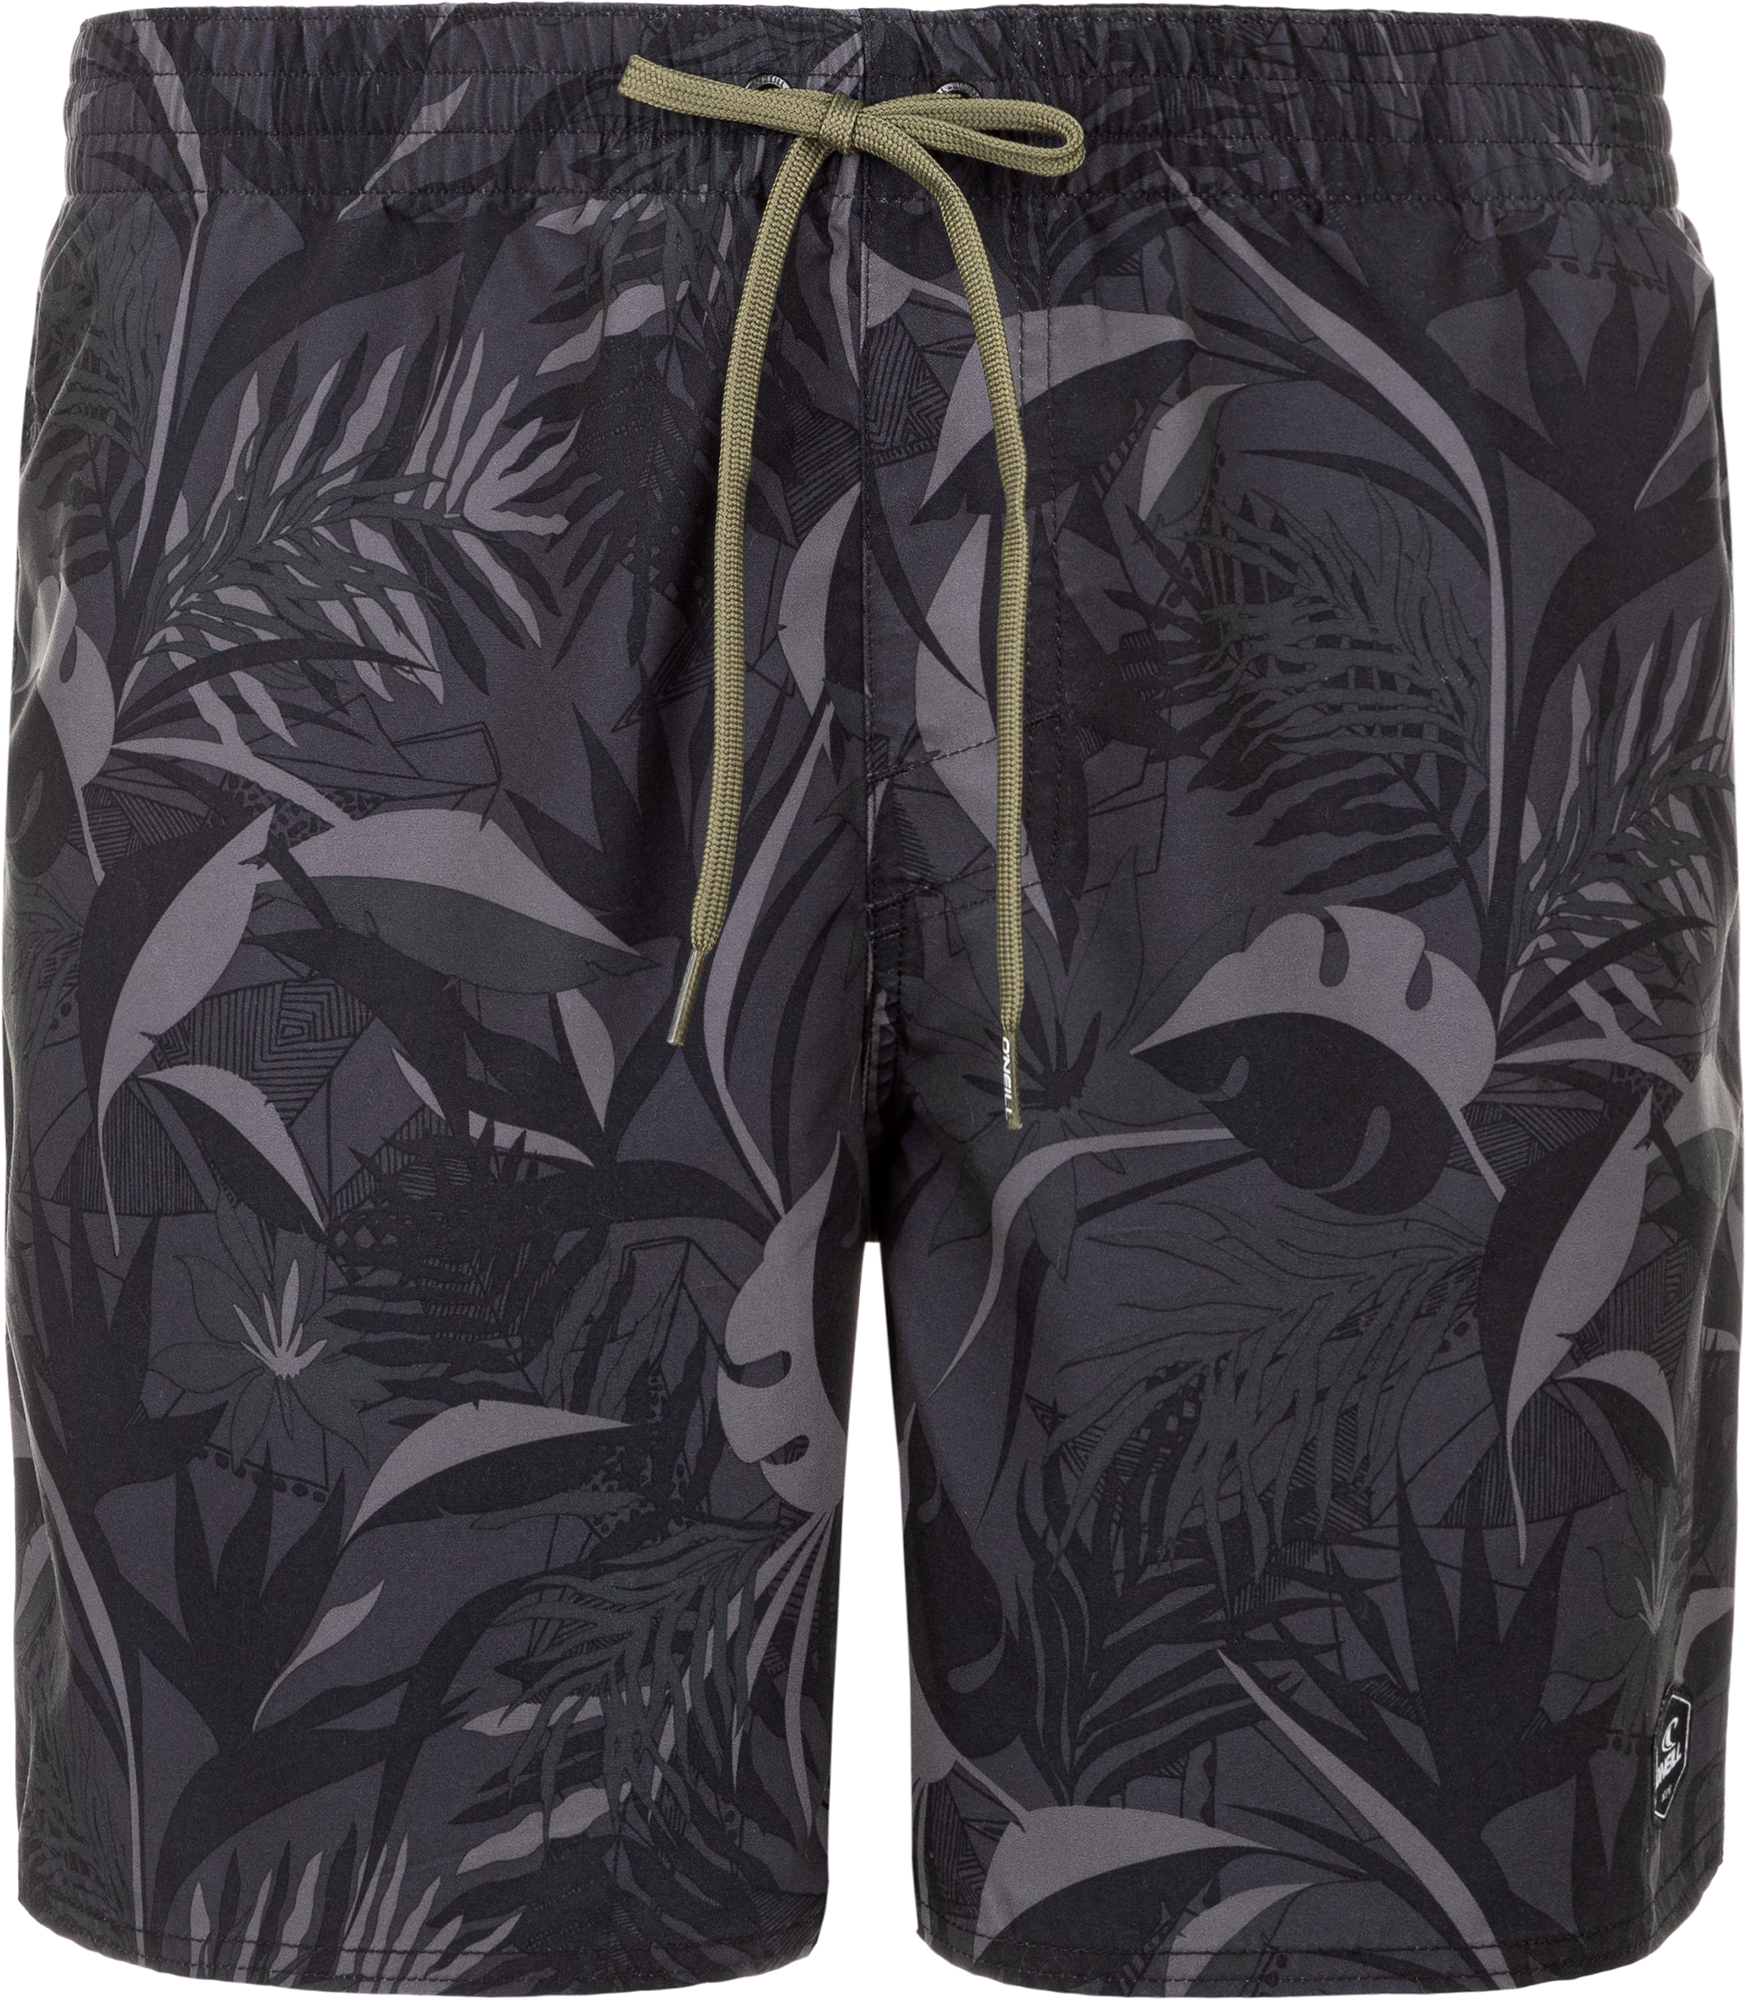 O'Neill Шорты пляжные мужские O'Neill Flower, размер 44 o neill шорты пляжные мужские o neill cali размер 54 56